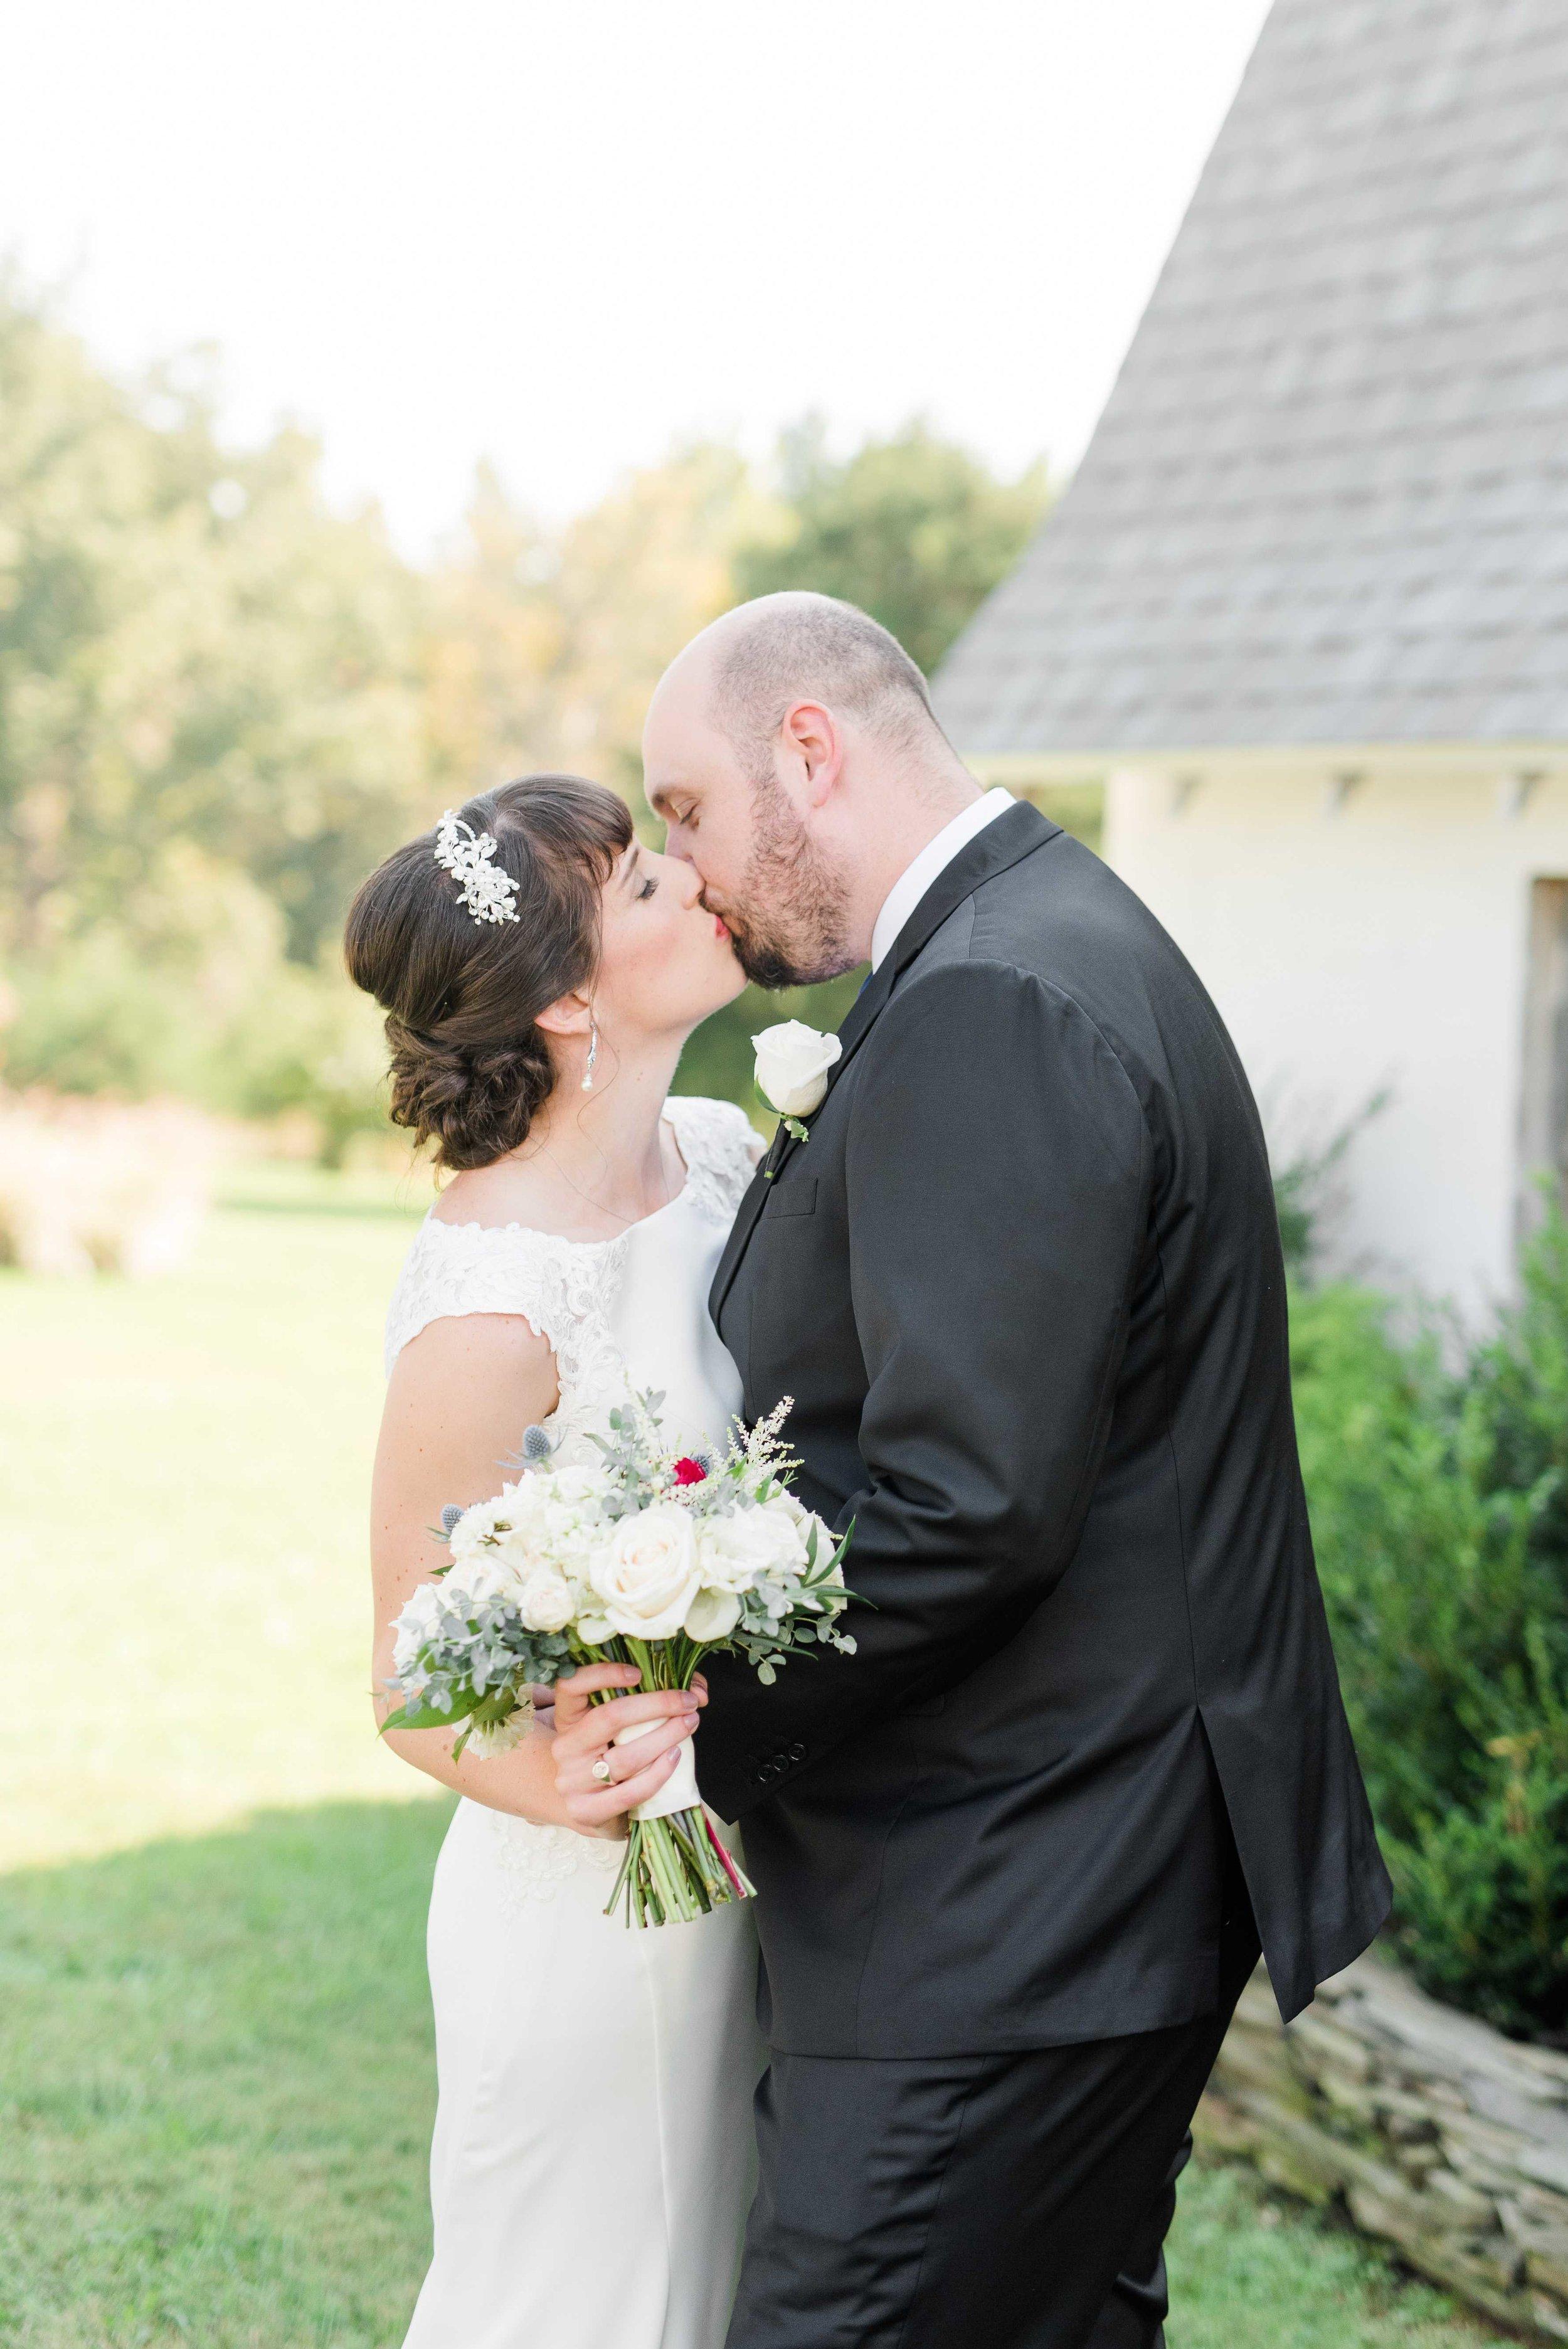 Lindsay & Dan, Emily Alyssa Photography .jpeg